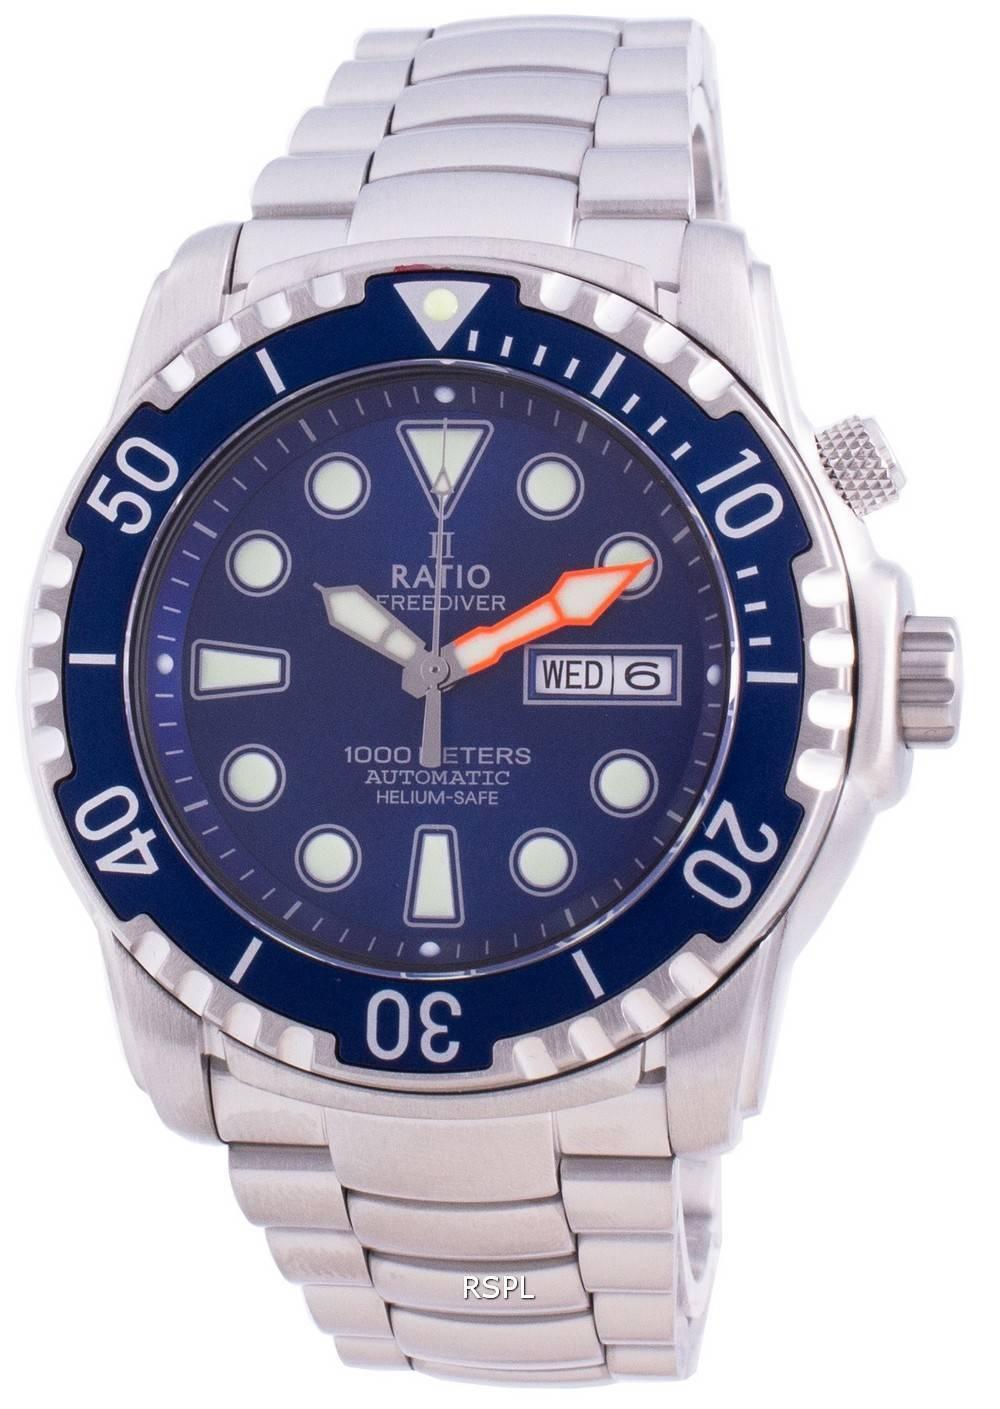 Ratio Free Diver Helium-Safe 1000M Sapphire Automatic 1068HA96-34VA-BLU Men's Watch